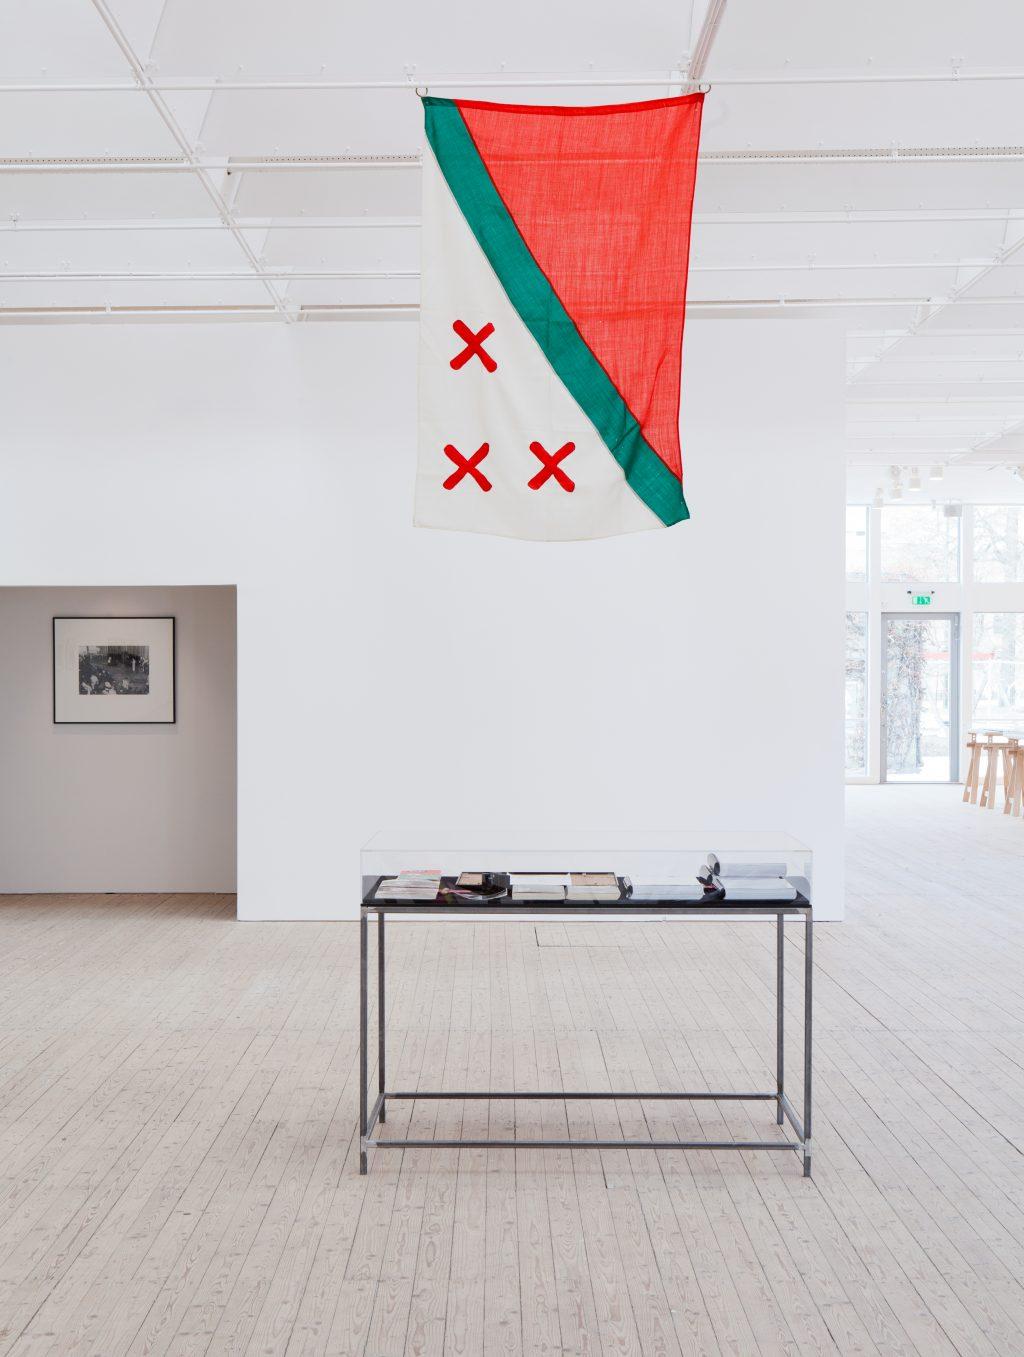 Sven Augustijnen, Spectres, installation view at Malmo, 2013